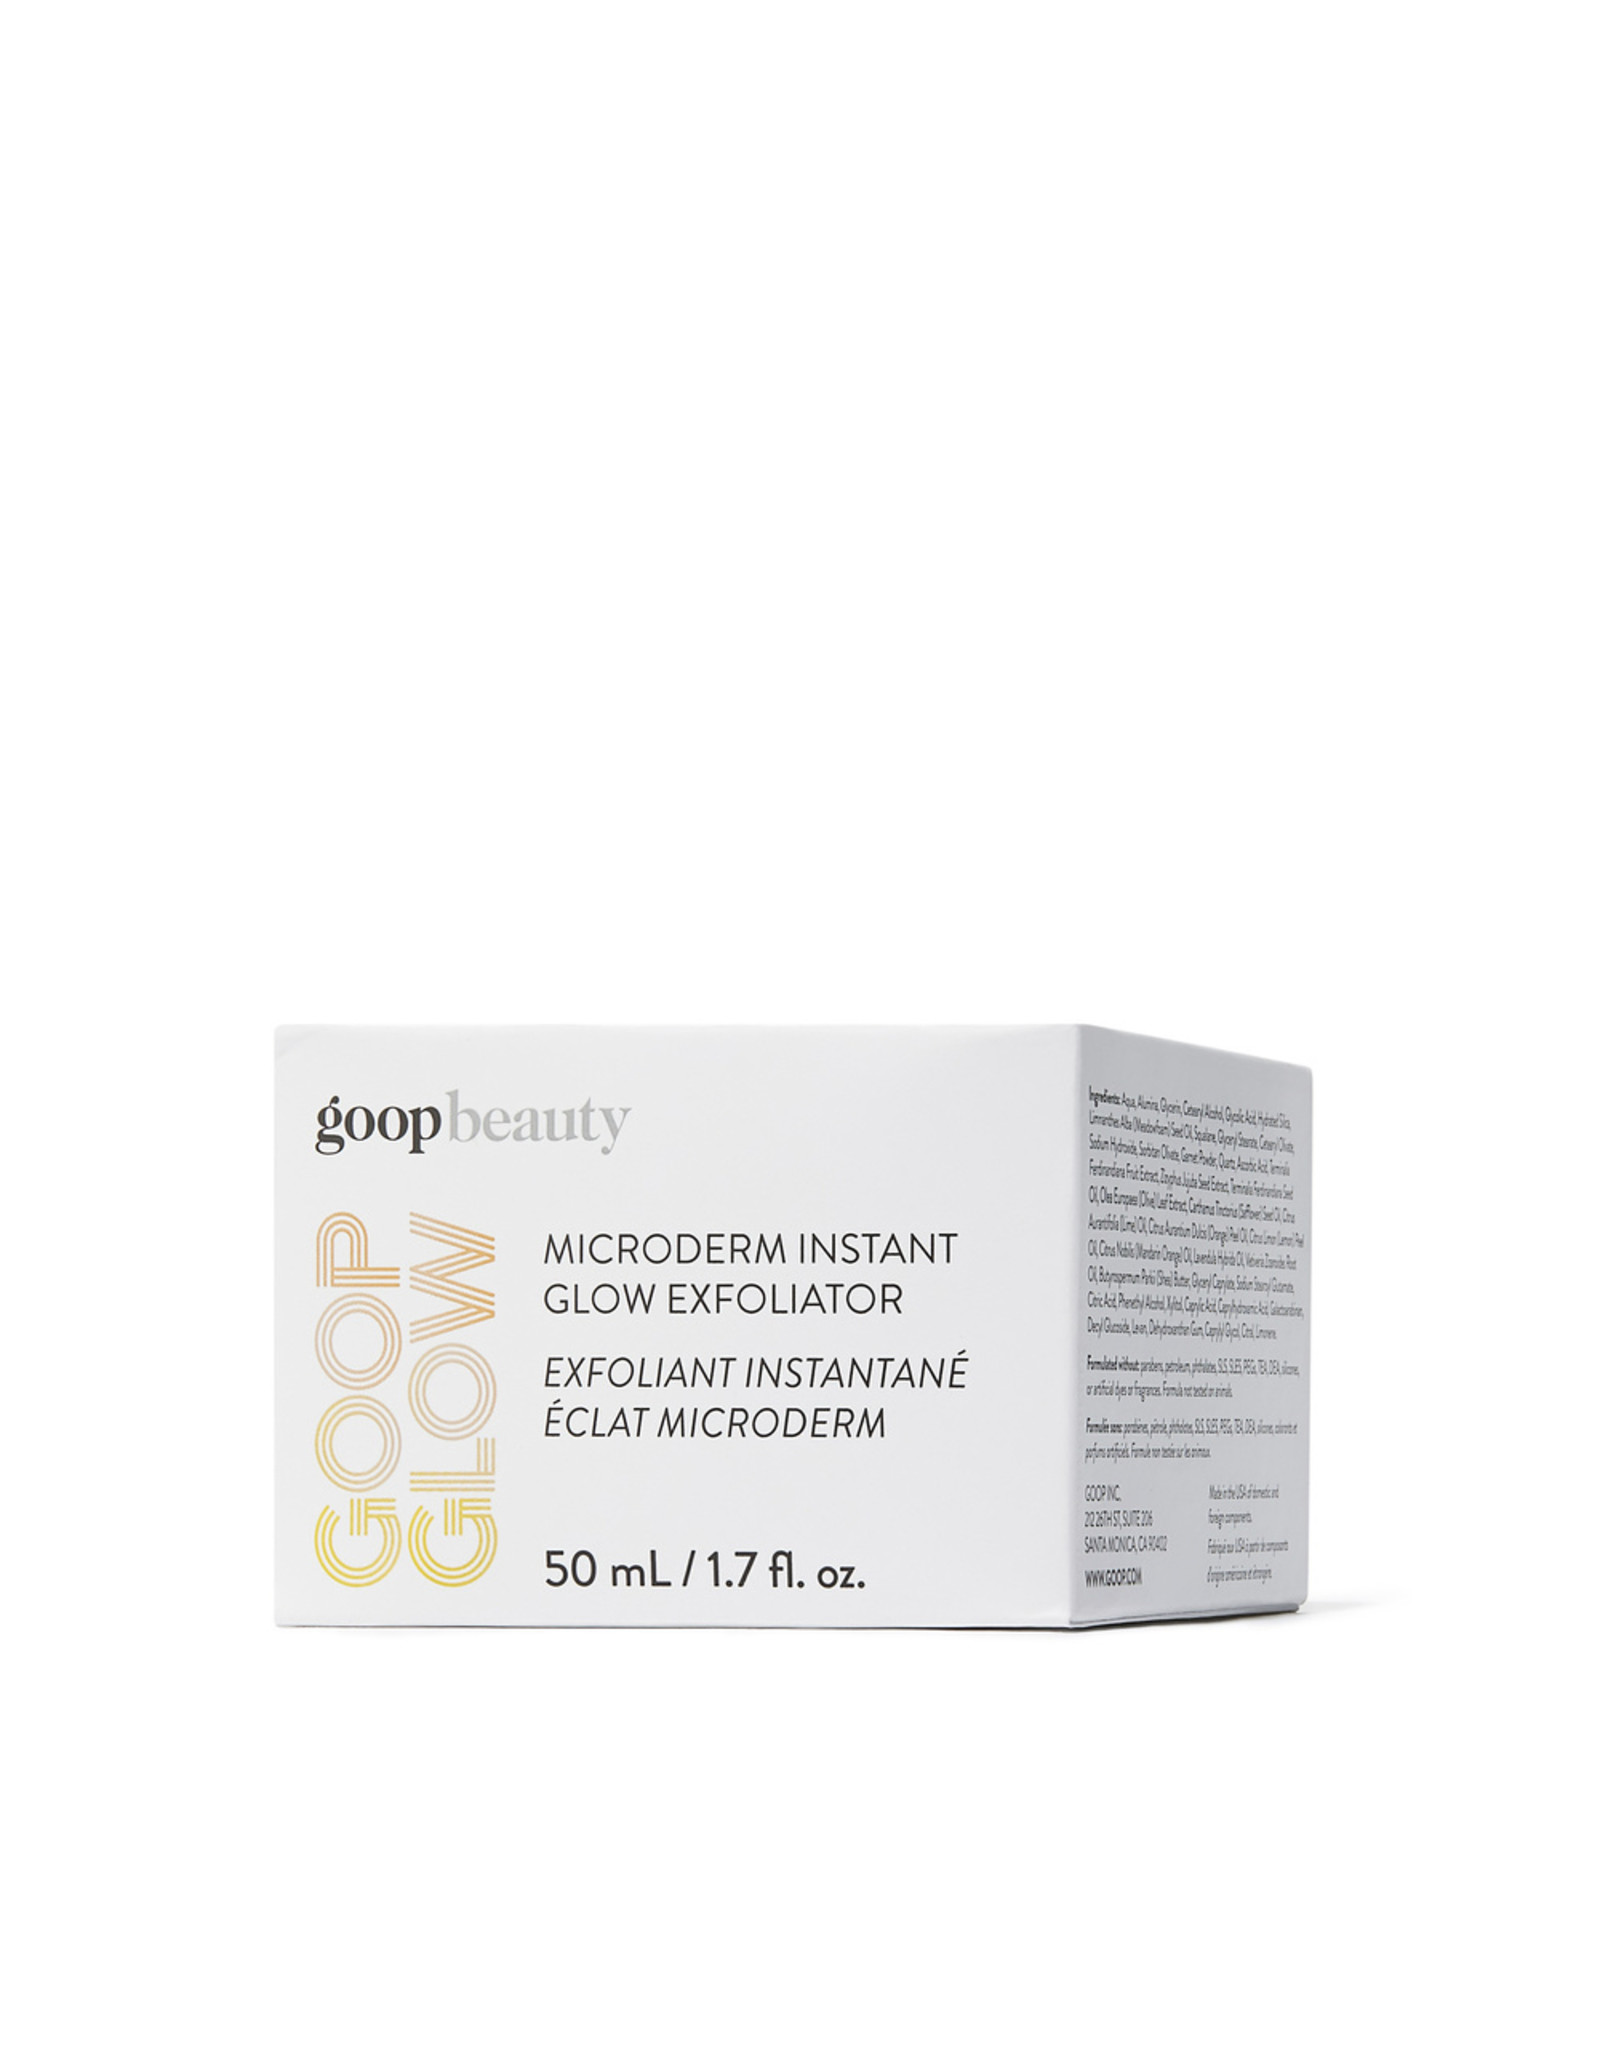 goop Skincare goop Beauty GOOPGLOW Microderm Instant Glow Exfoliator (Size: 50ml)